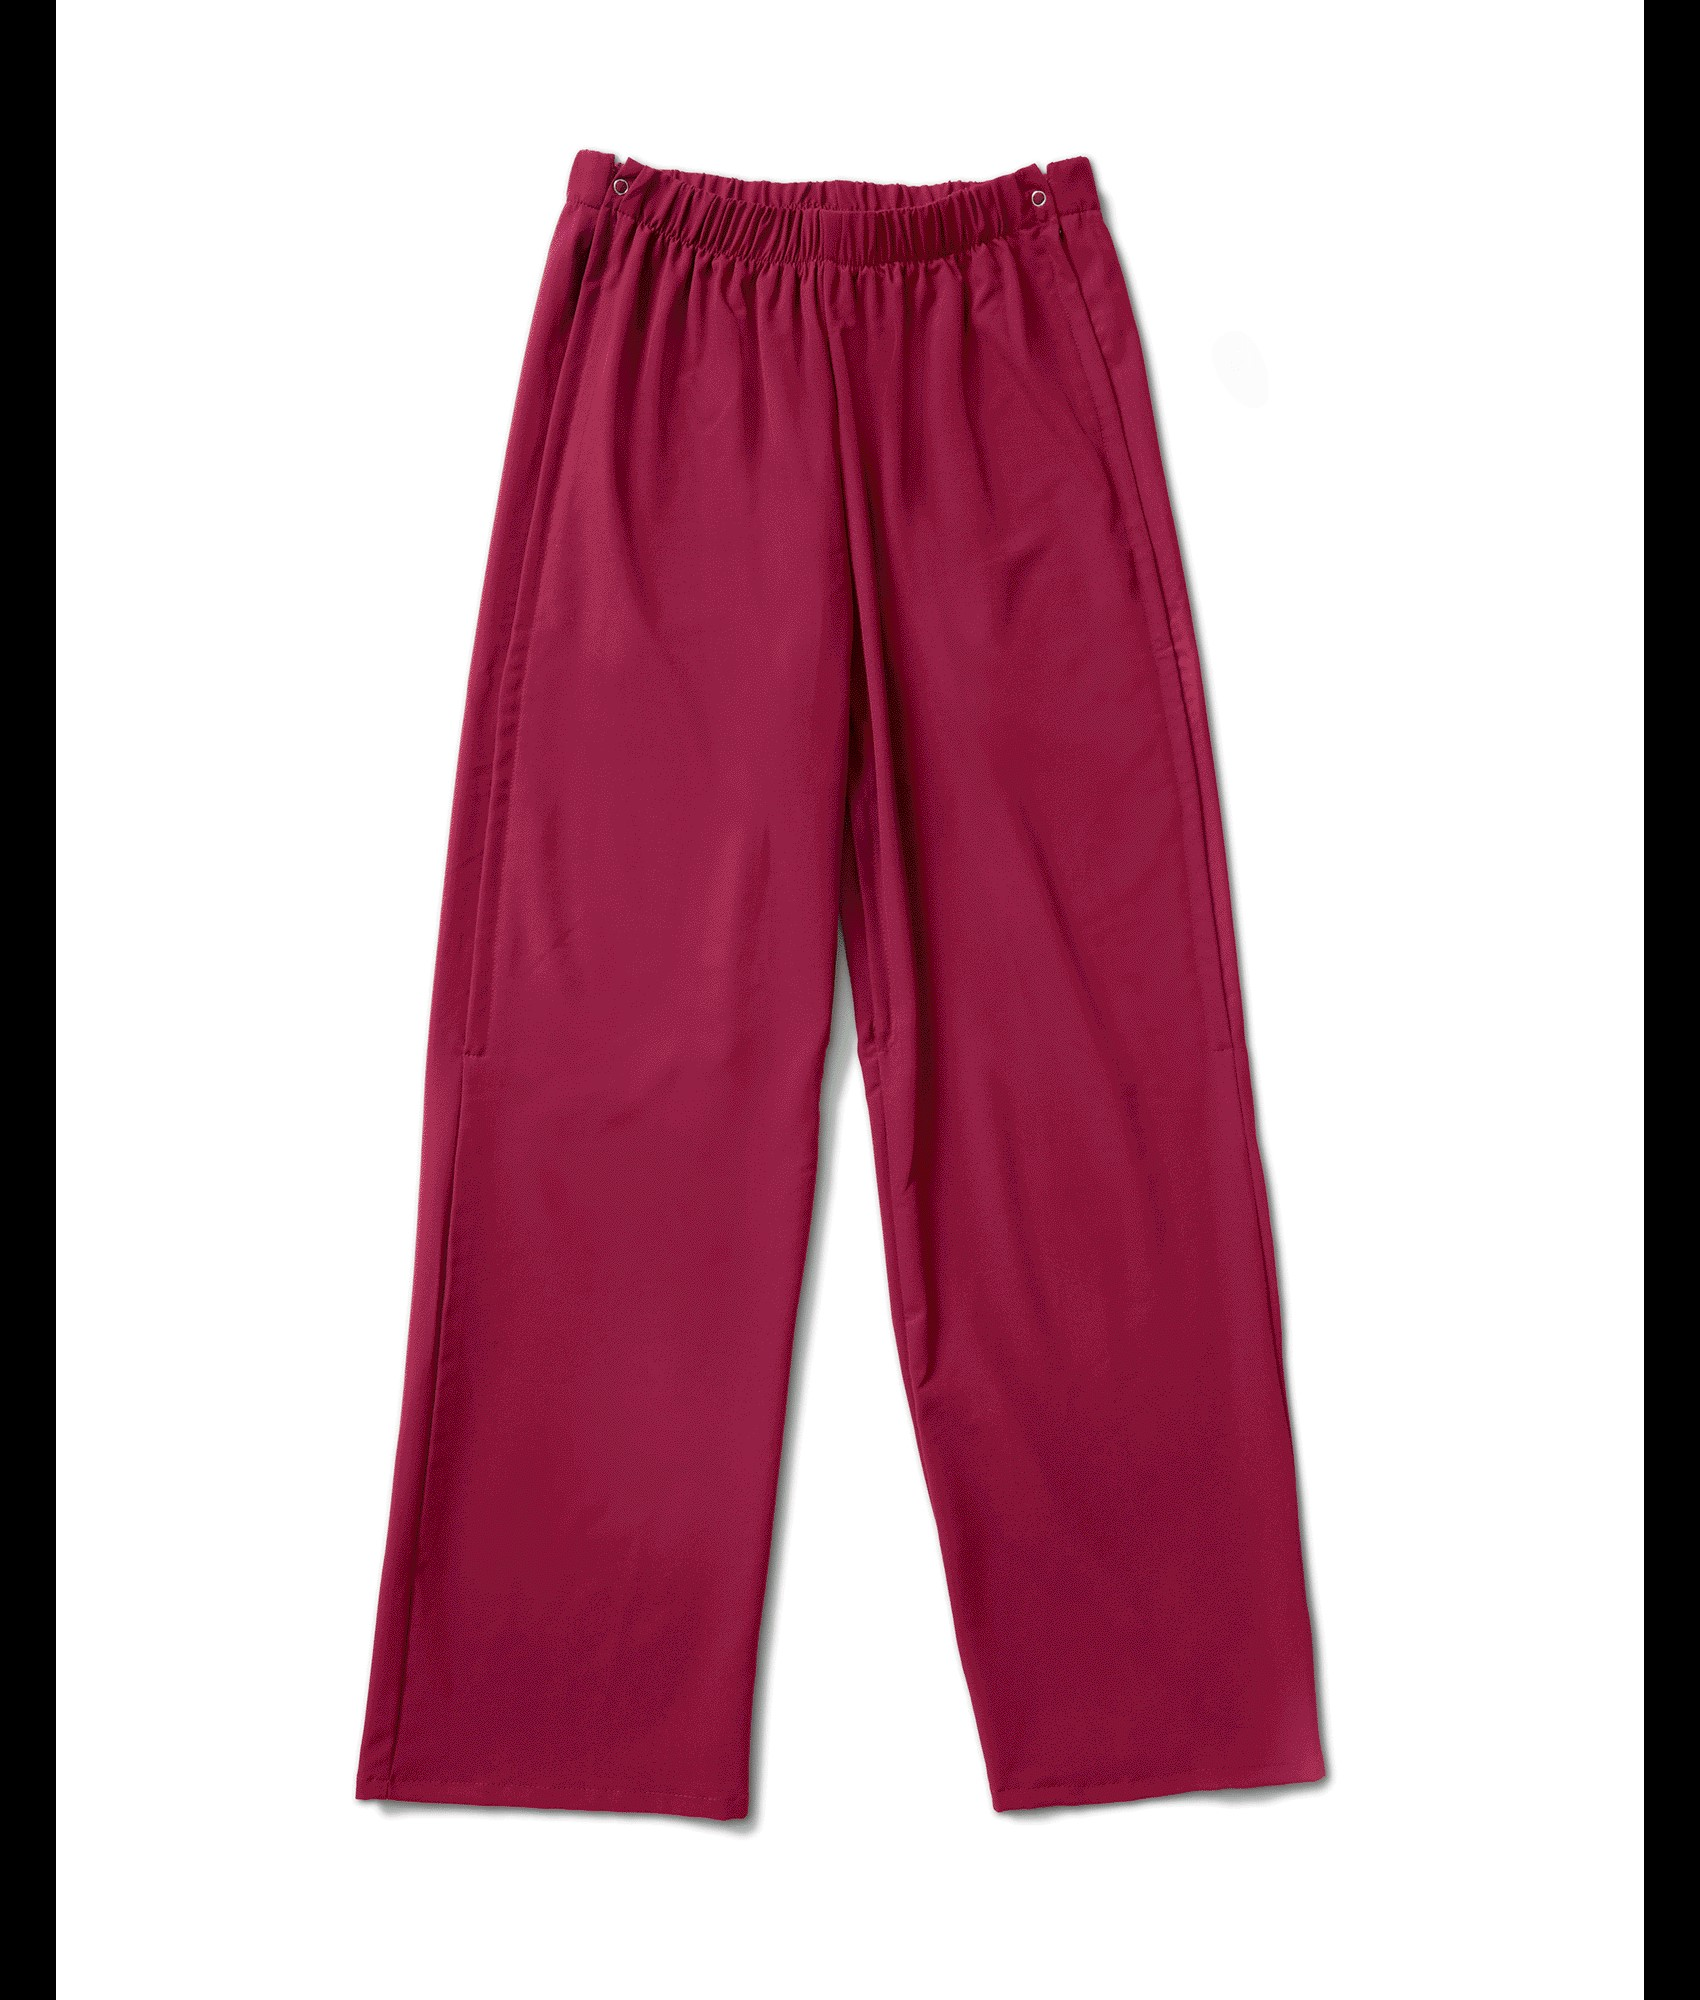 CareZips CareZips-46832-1240-L Easy Change Trousers & Pants, Plumberry - Large